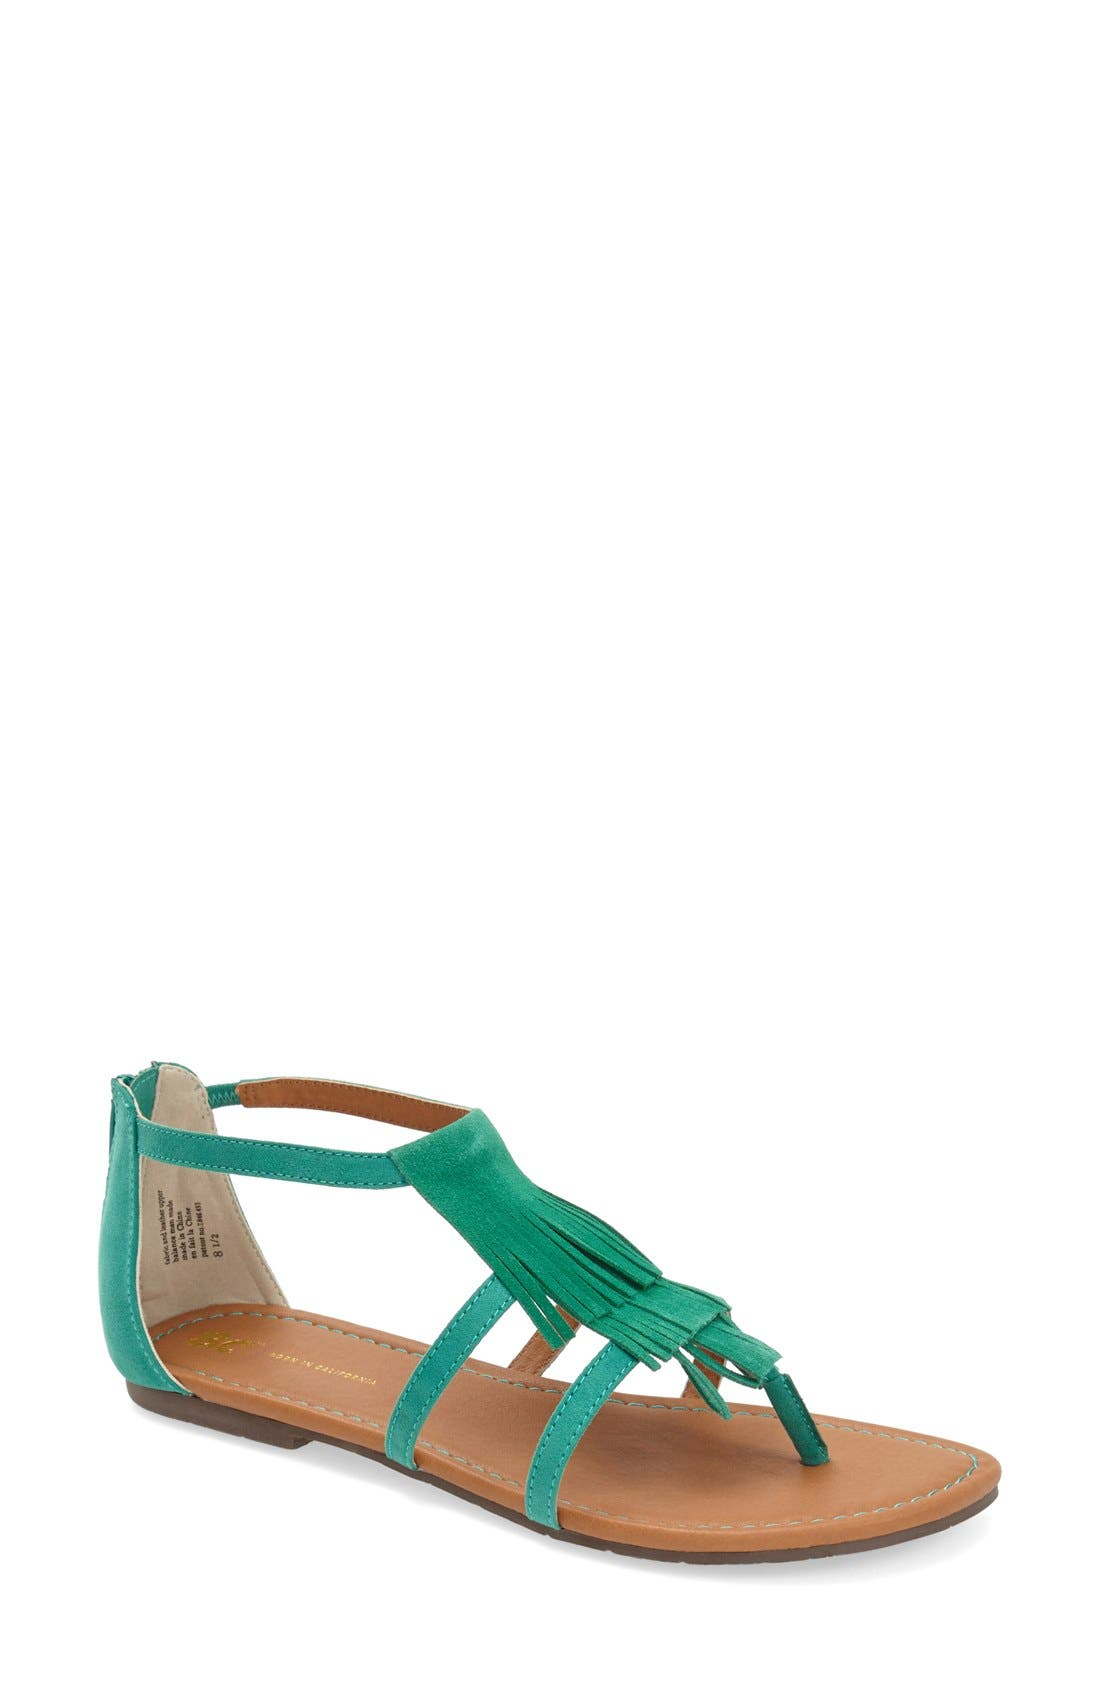 Main Image - BC Footwear 'Maltese' Fringe Sandal (Women)